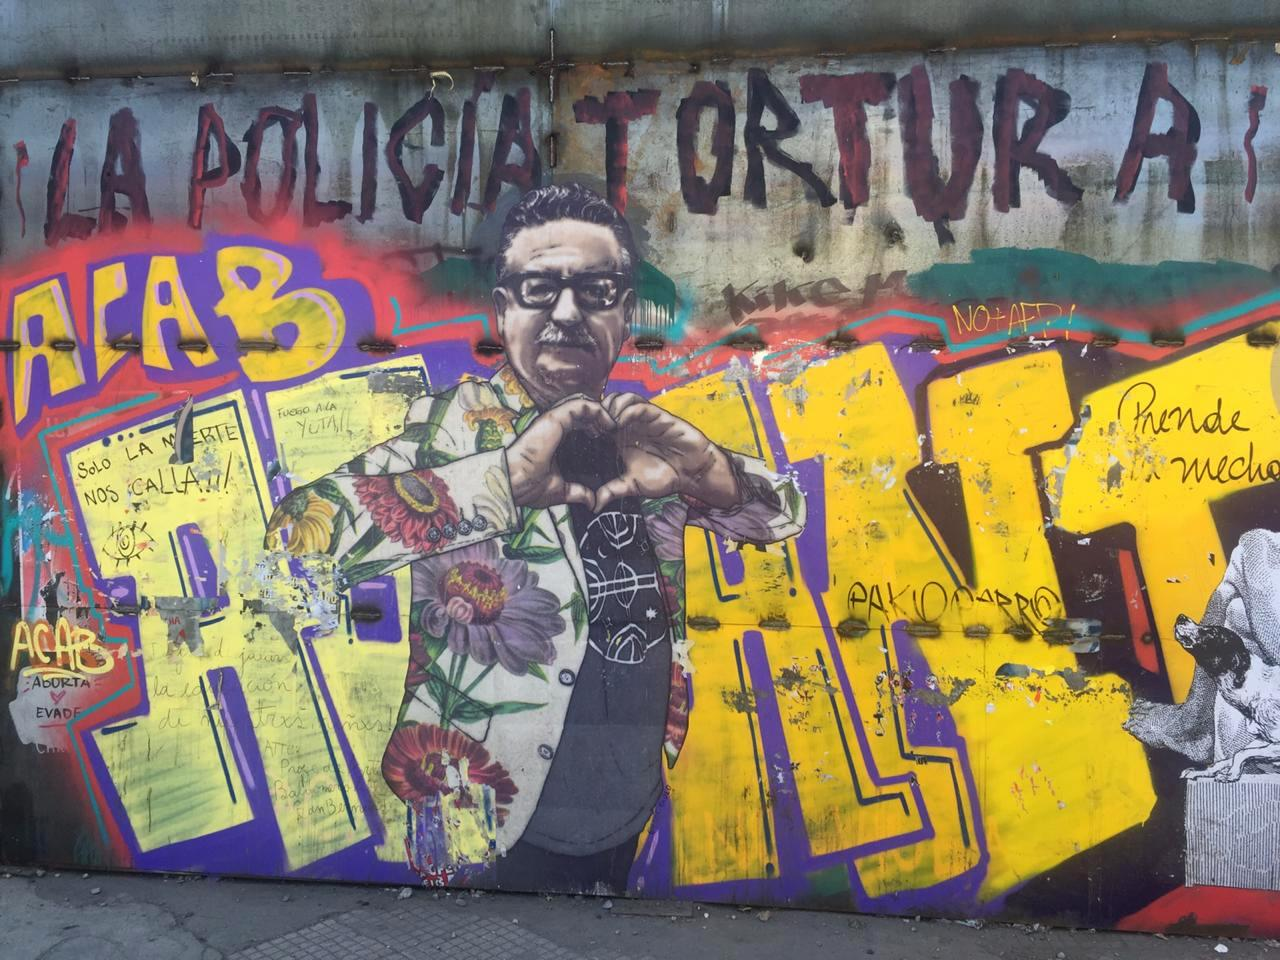 salvador allende santiago chile protesta policia tortura propaganda politica buenosairesstreetart.com